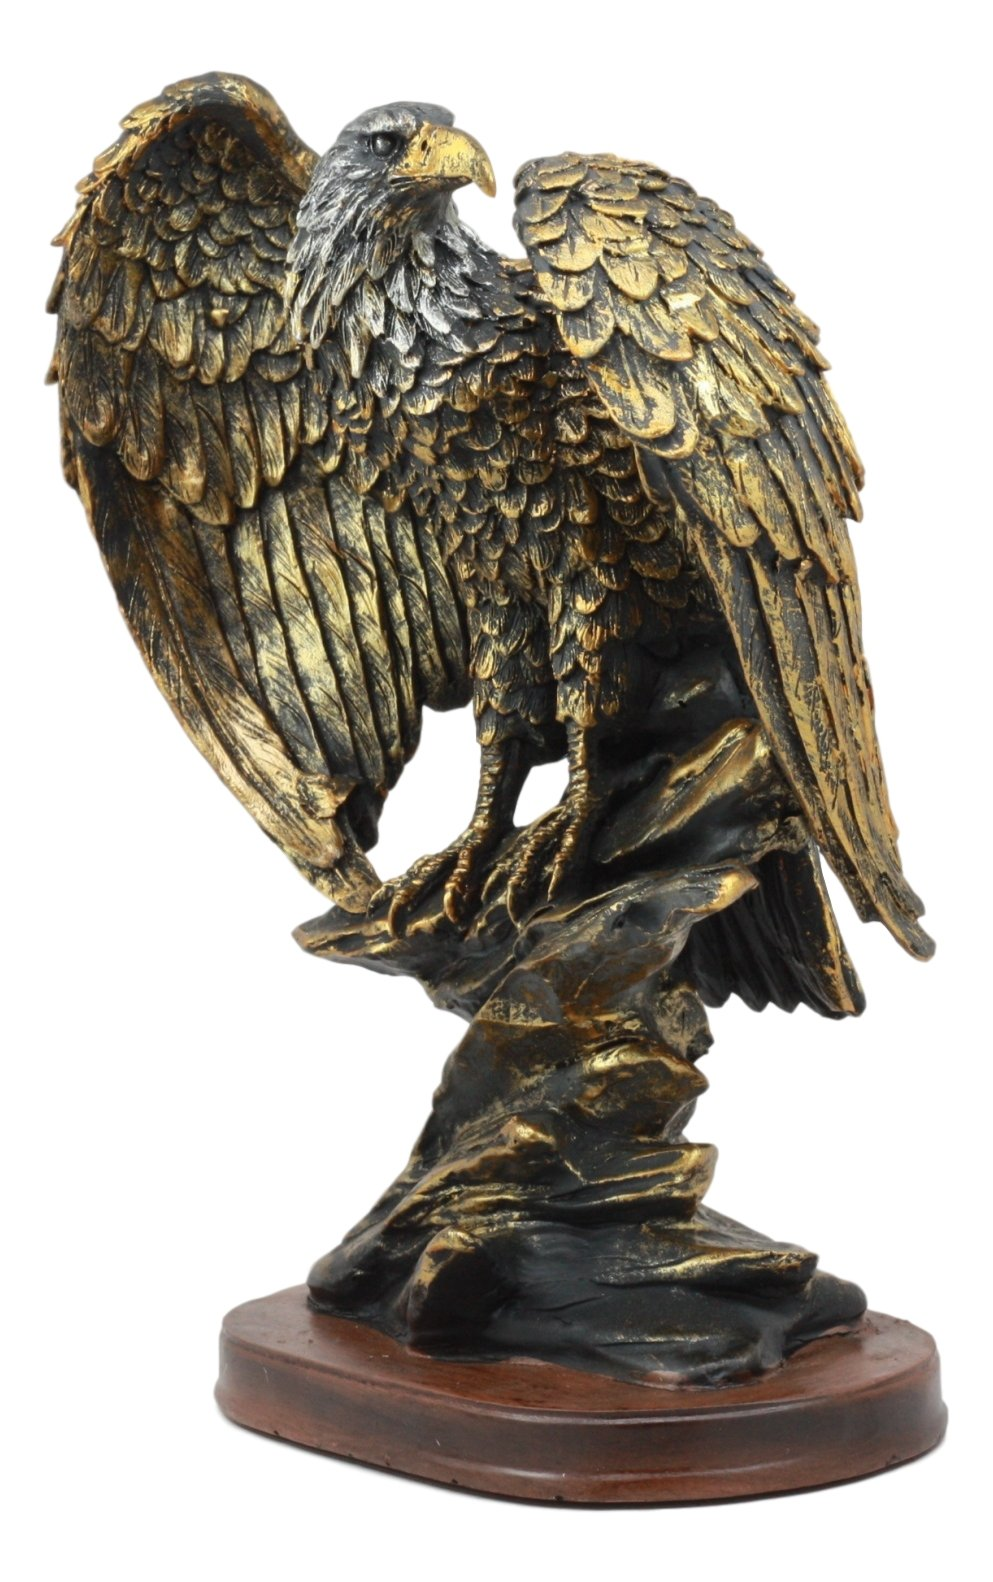 Ebros 10.25'' Tall Patriotic Bald Eagle On Rocks Statue Wild Bird Eagle Decorative Bronze Patina Resin Figurine